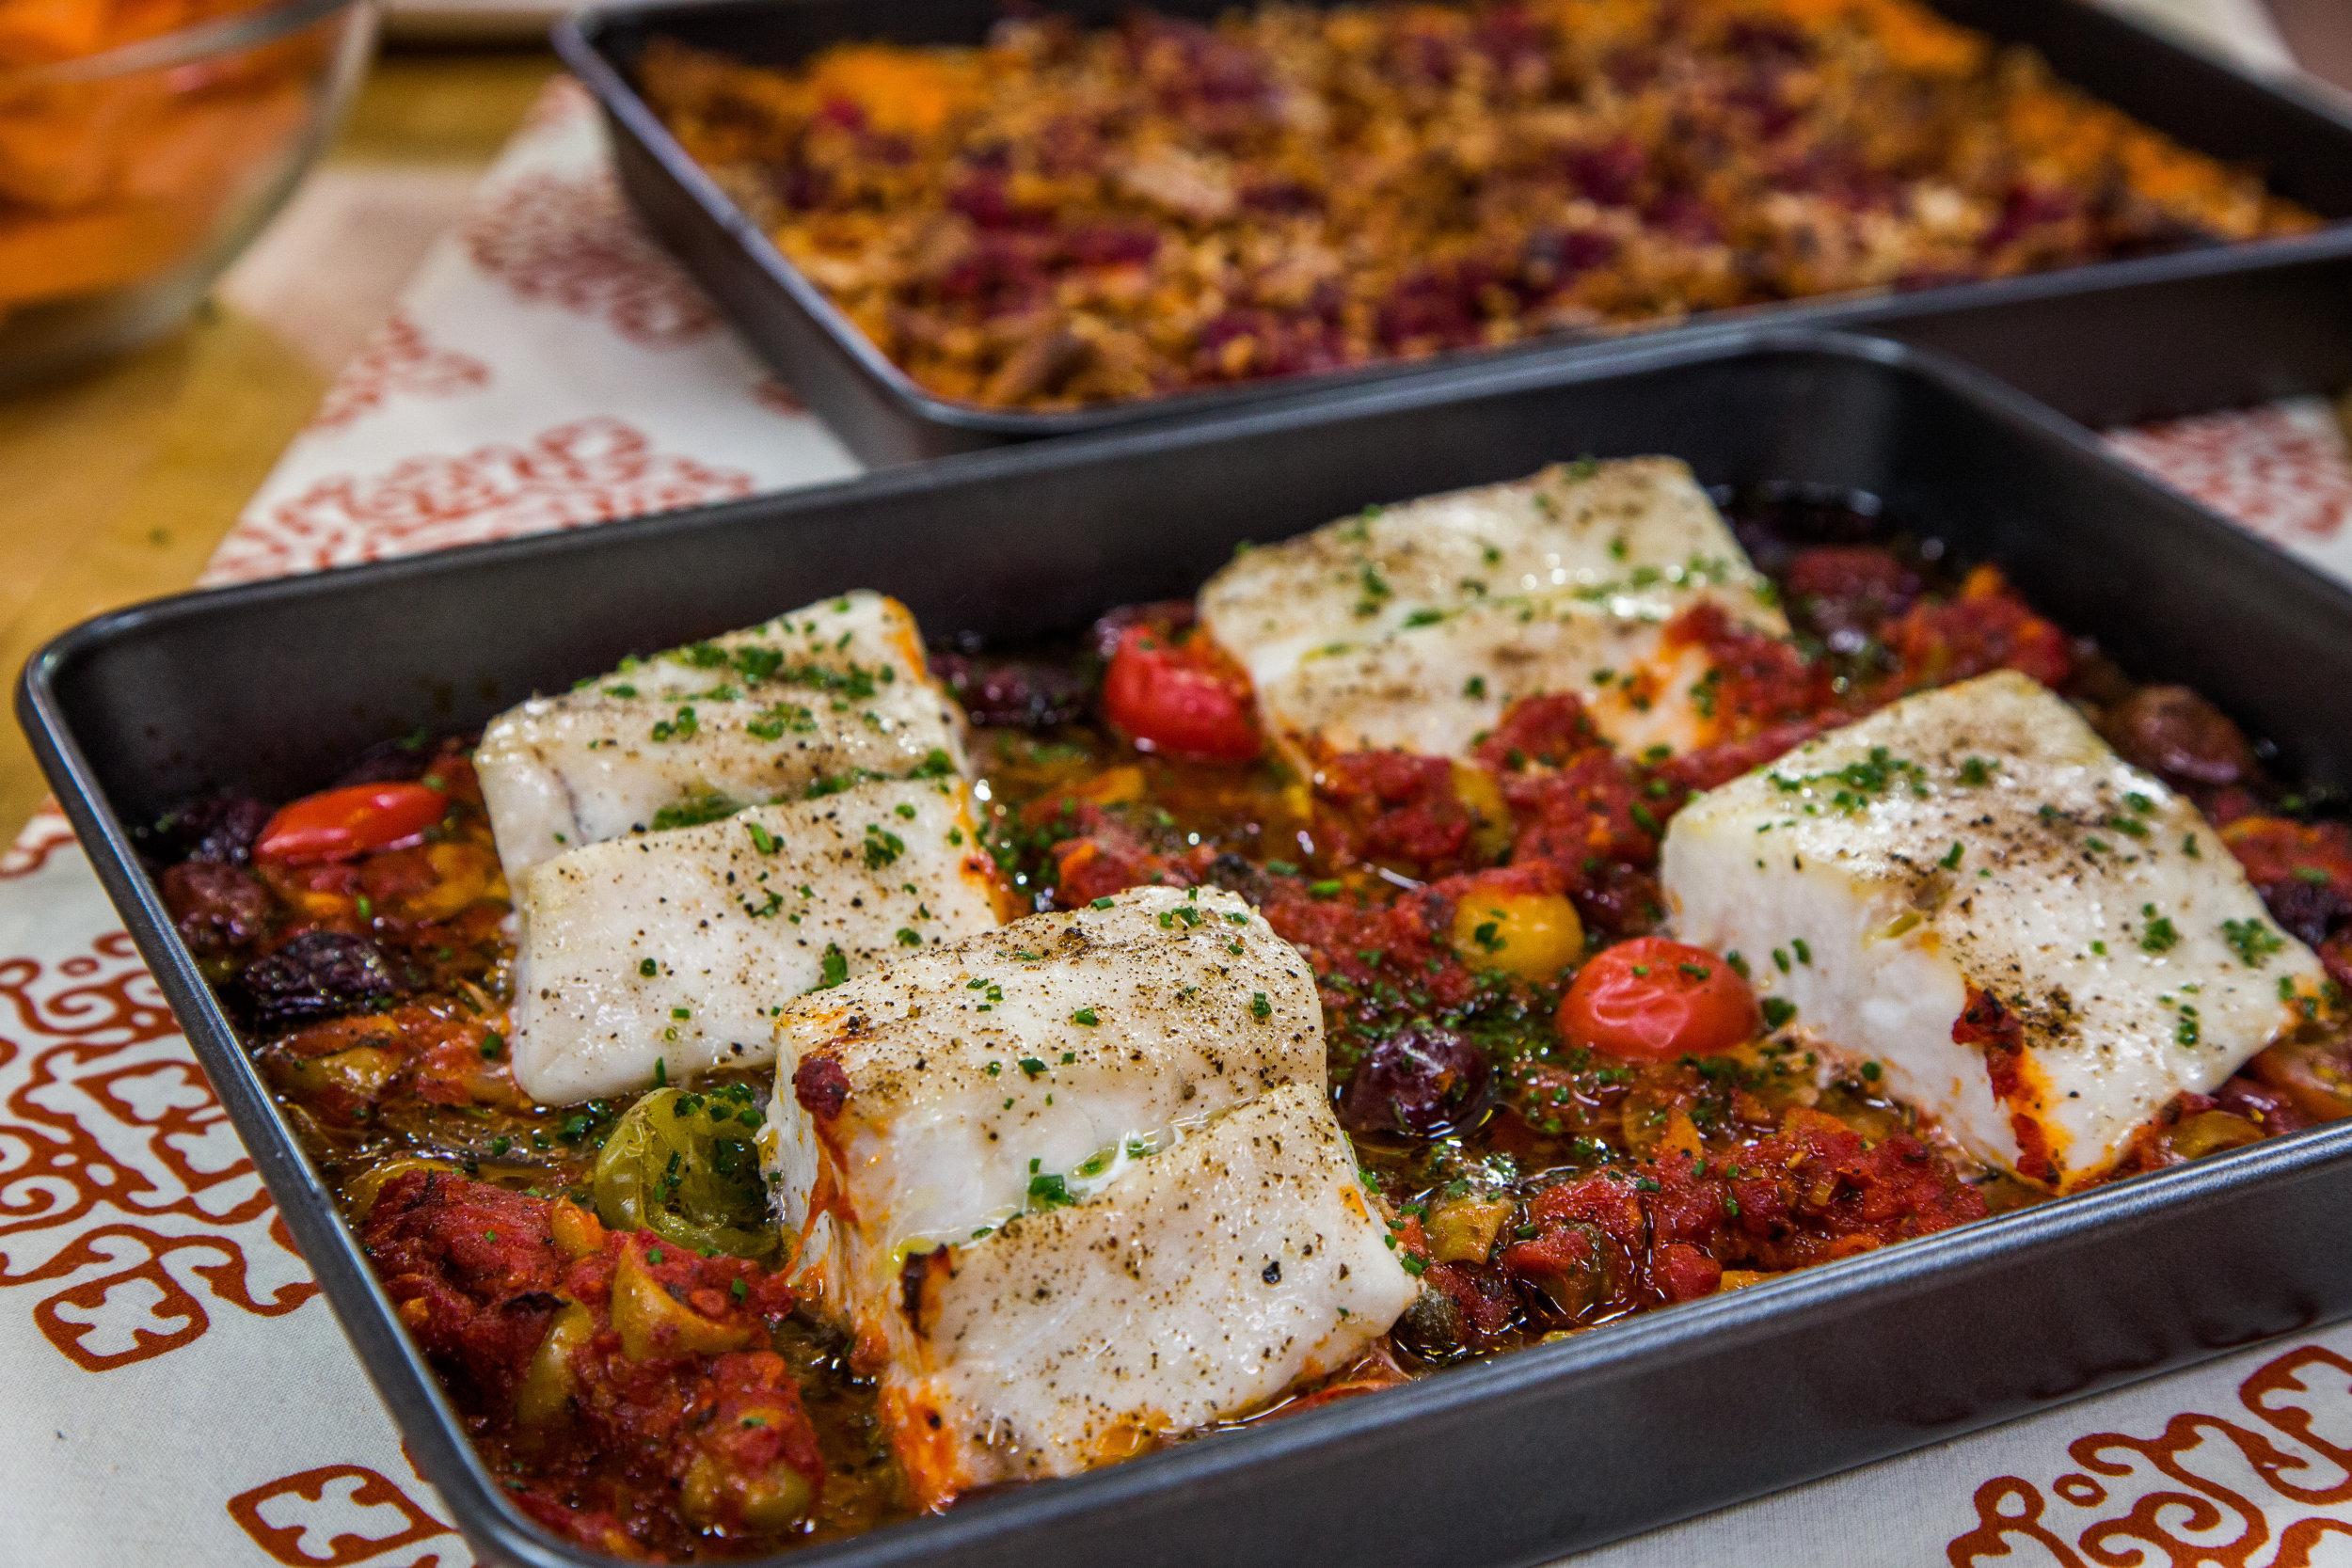 Oven baked snapper fillet recipes for Fish veracruz recipe